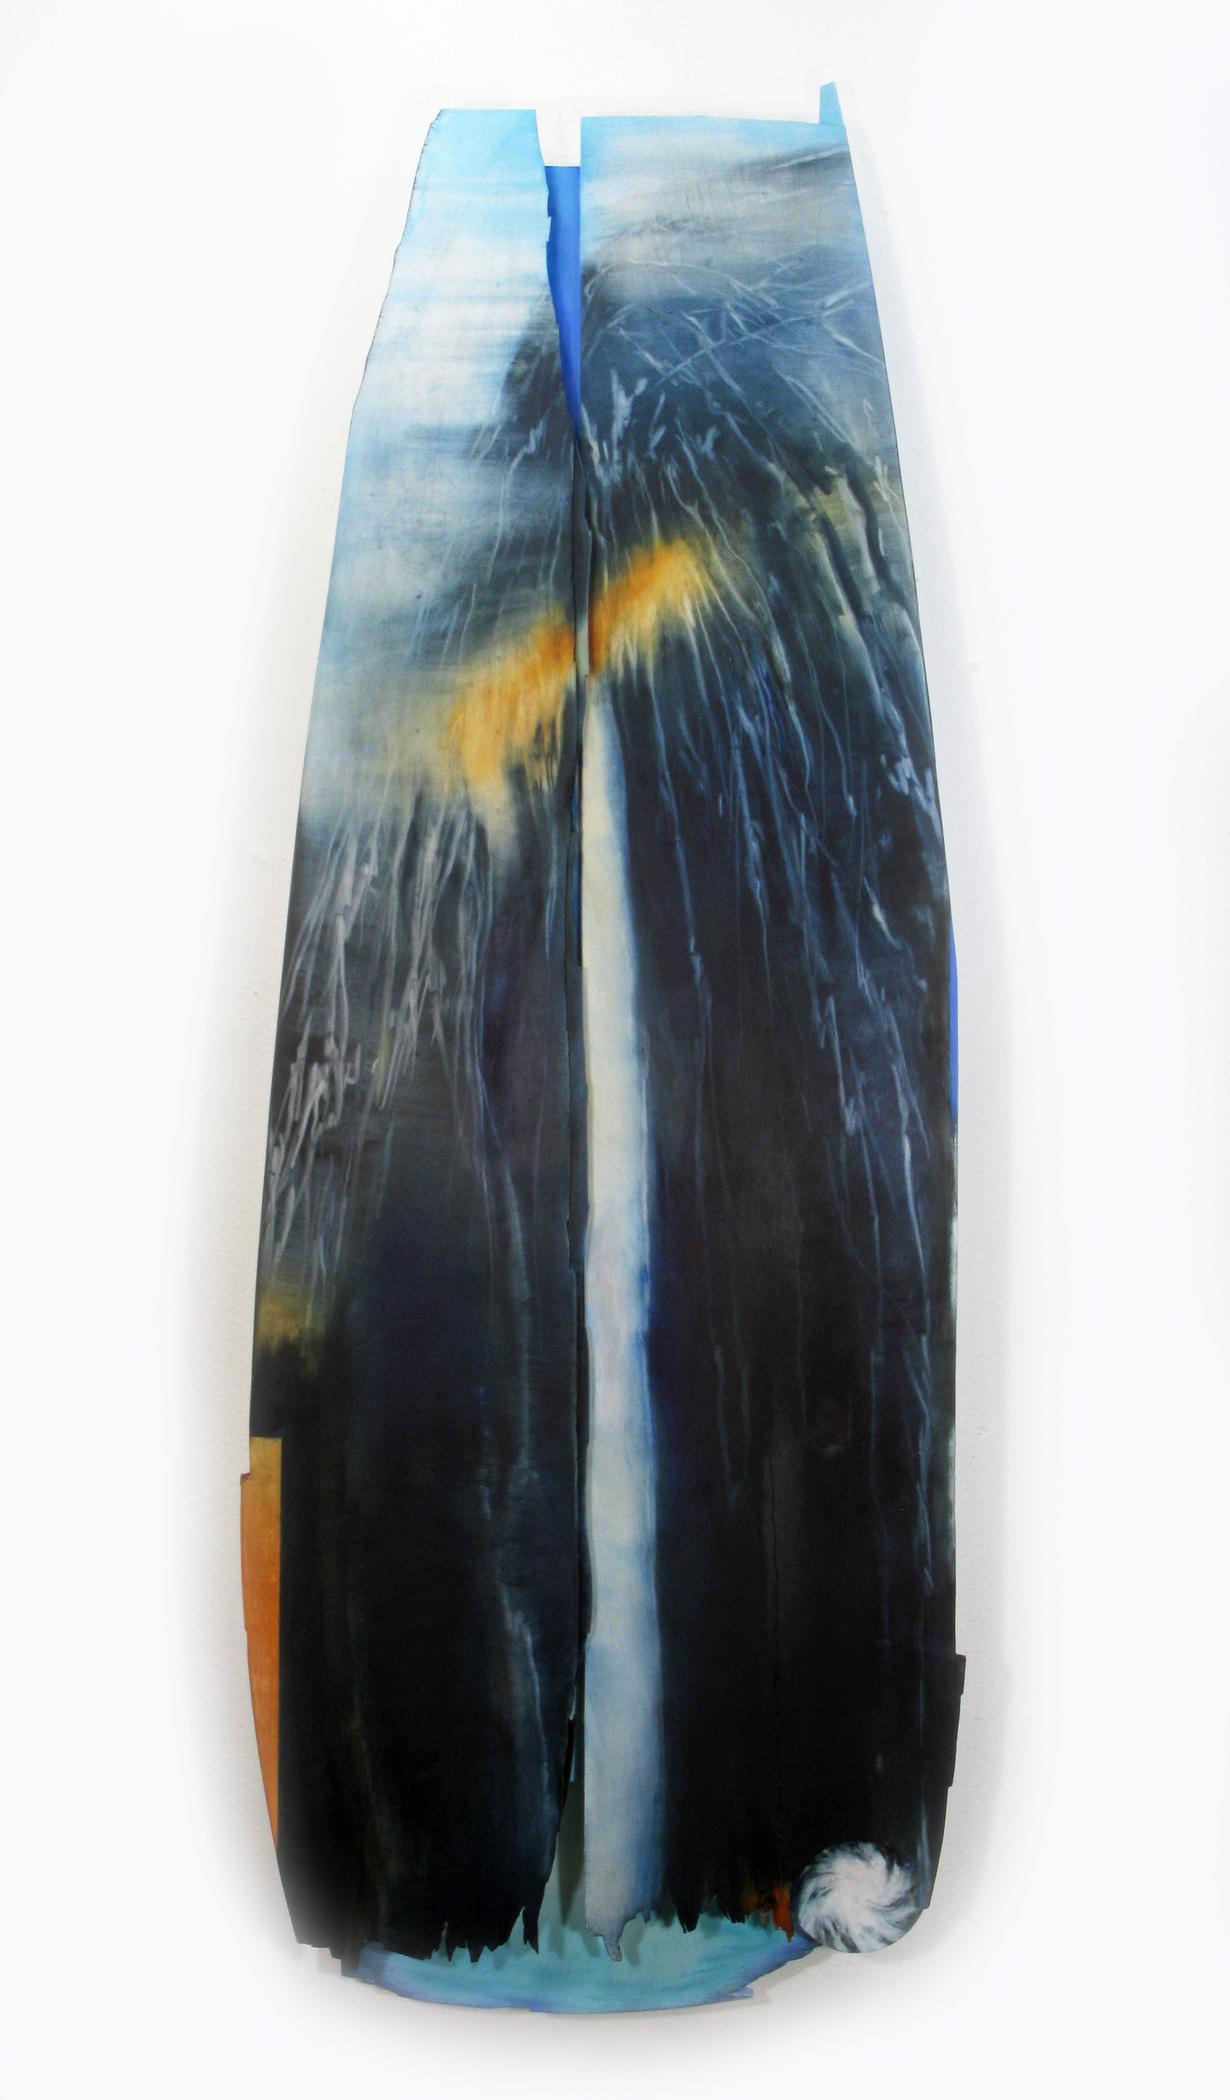 Kolman & Pryor Gallery_Cameron Zebrun_Near Eagle Peak_2019_oil on wood_46 x 17 x 4 inches_�2700.jpg